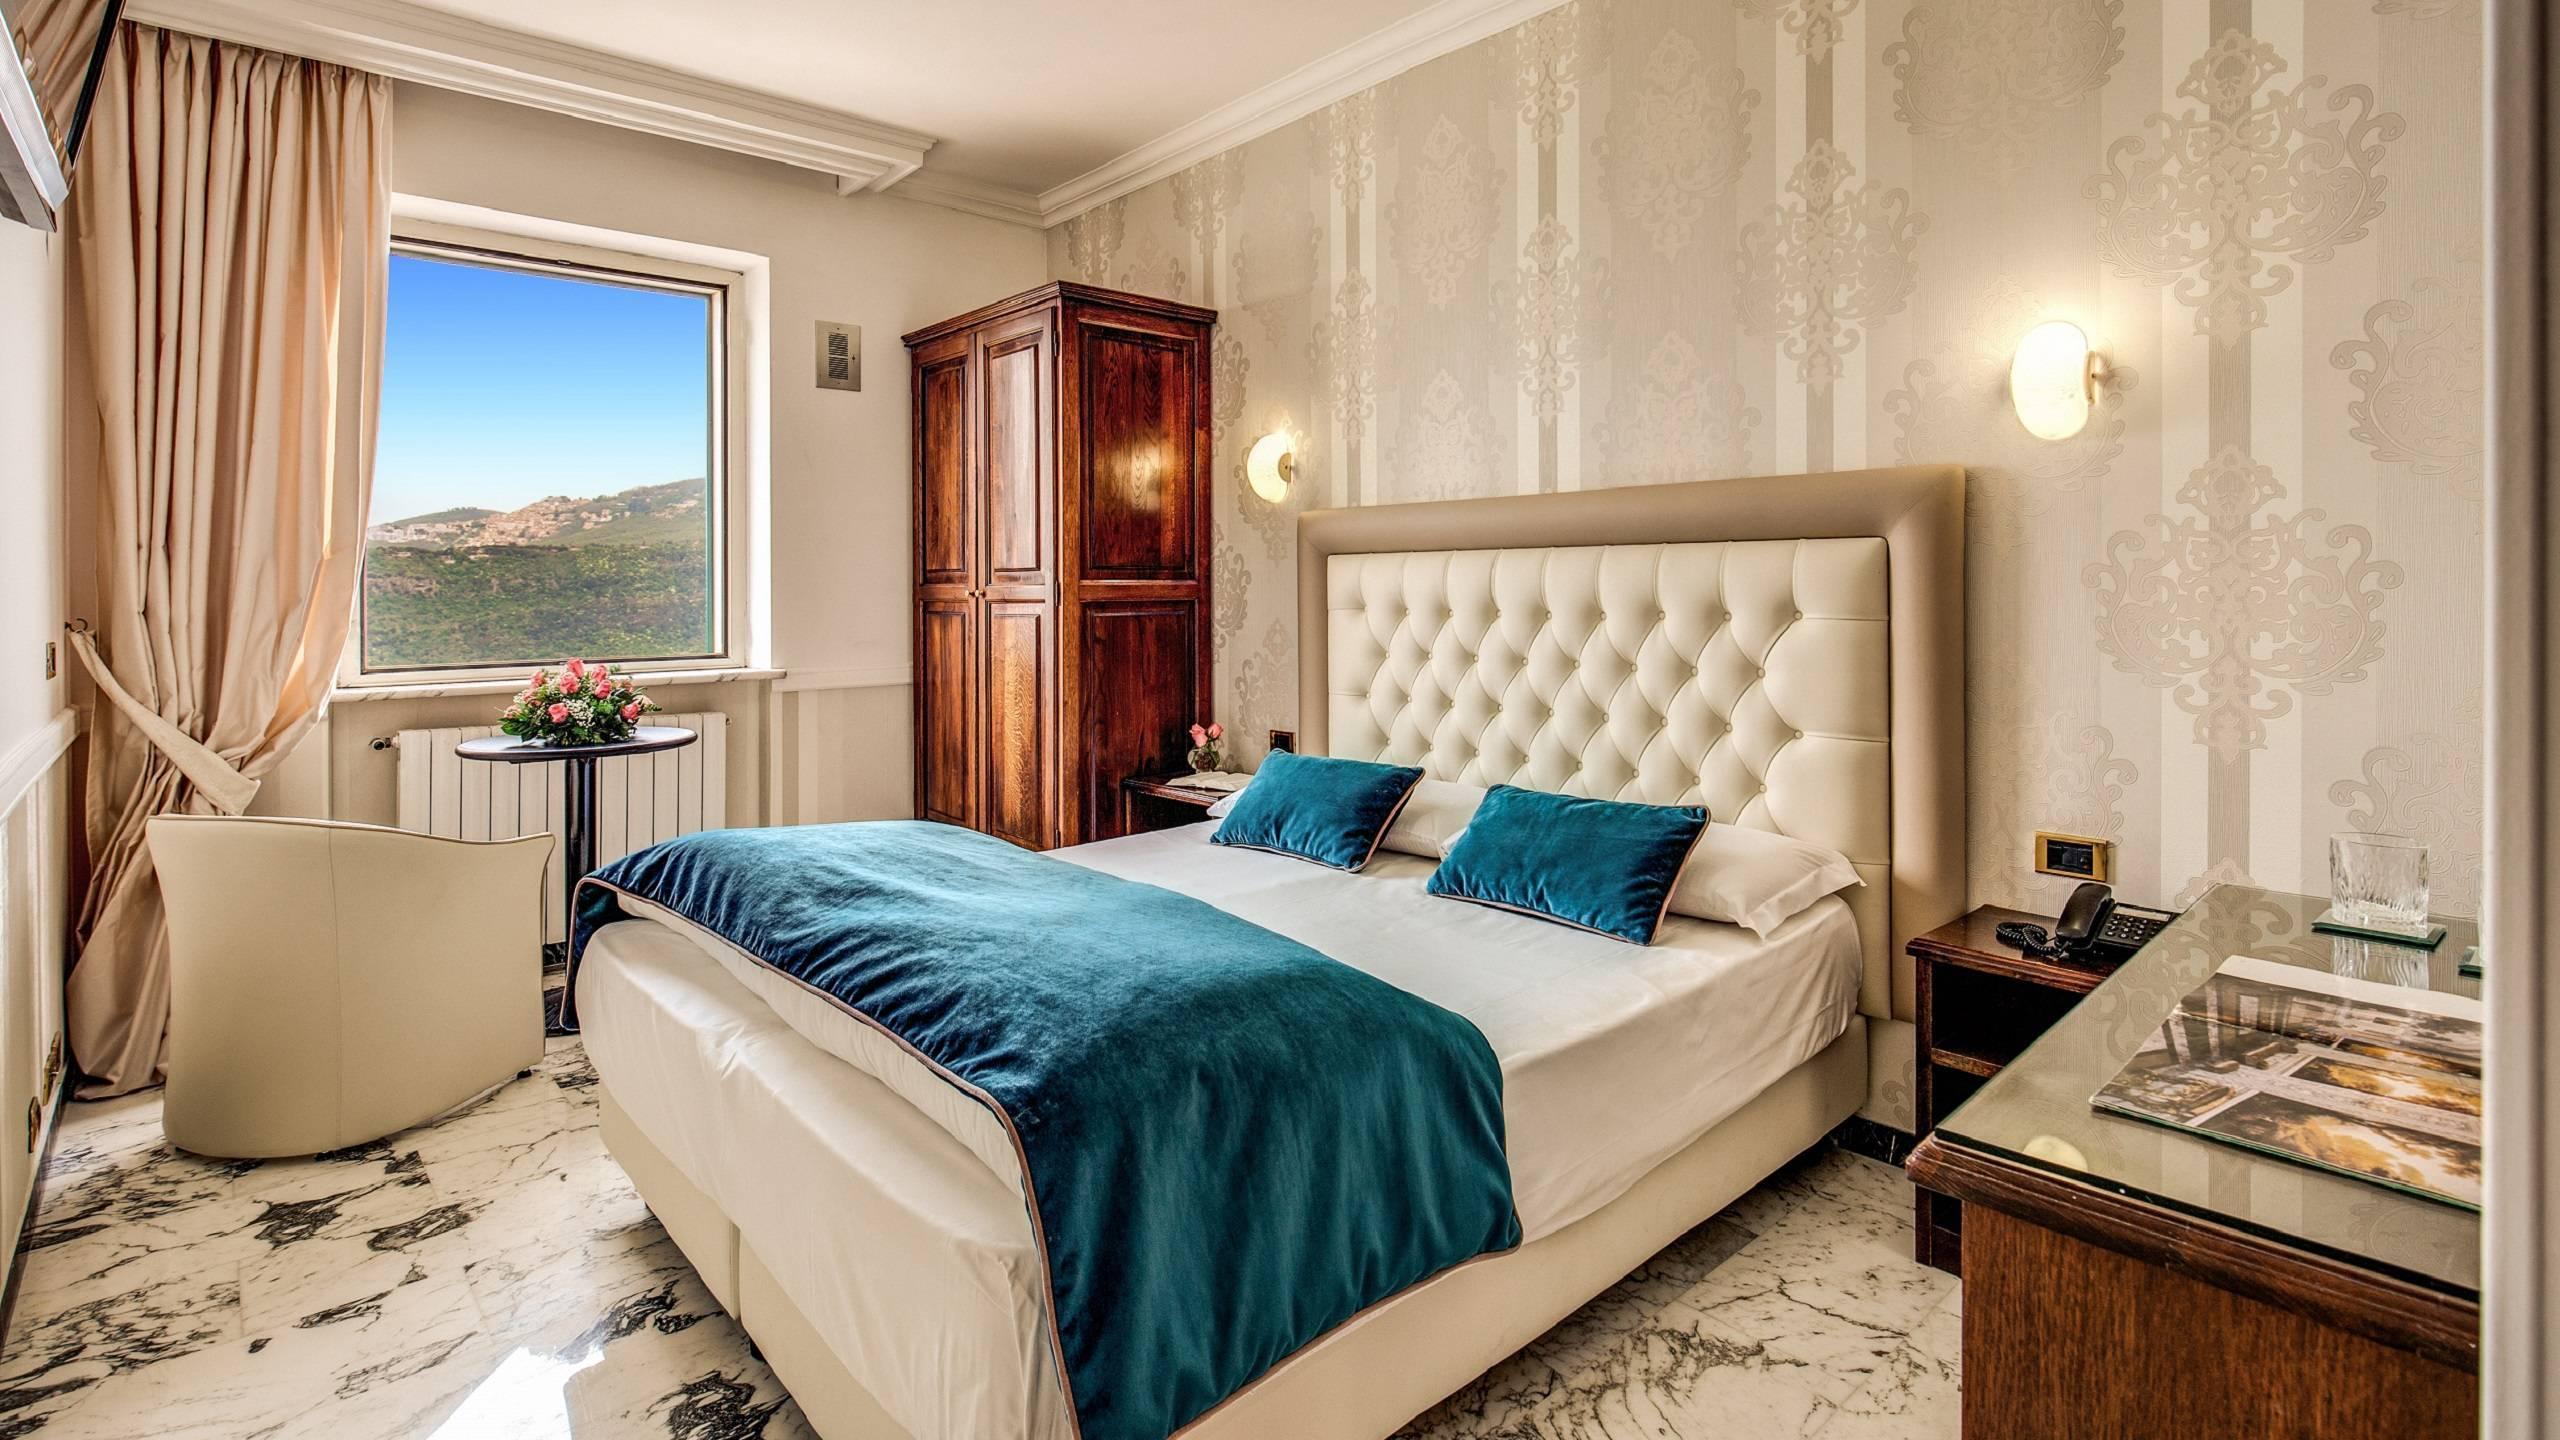 Hotel-Castel-Vecchio-Castel-Gandolfo-rooms-071